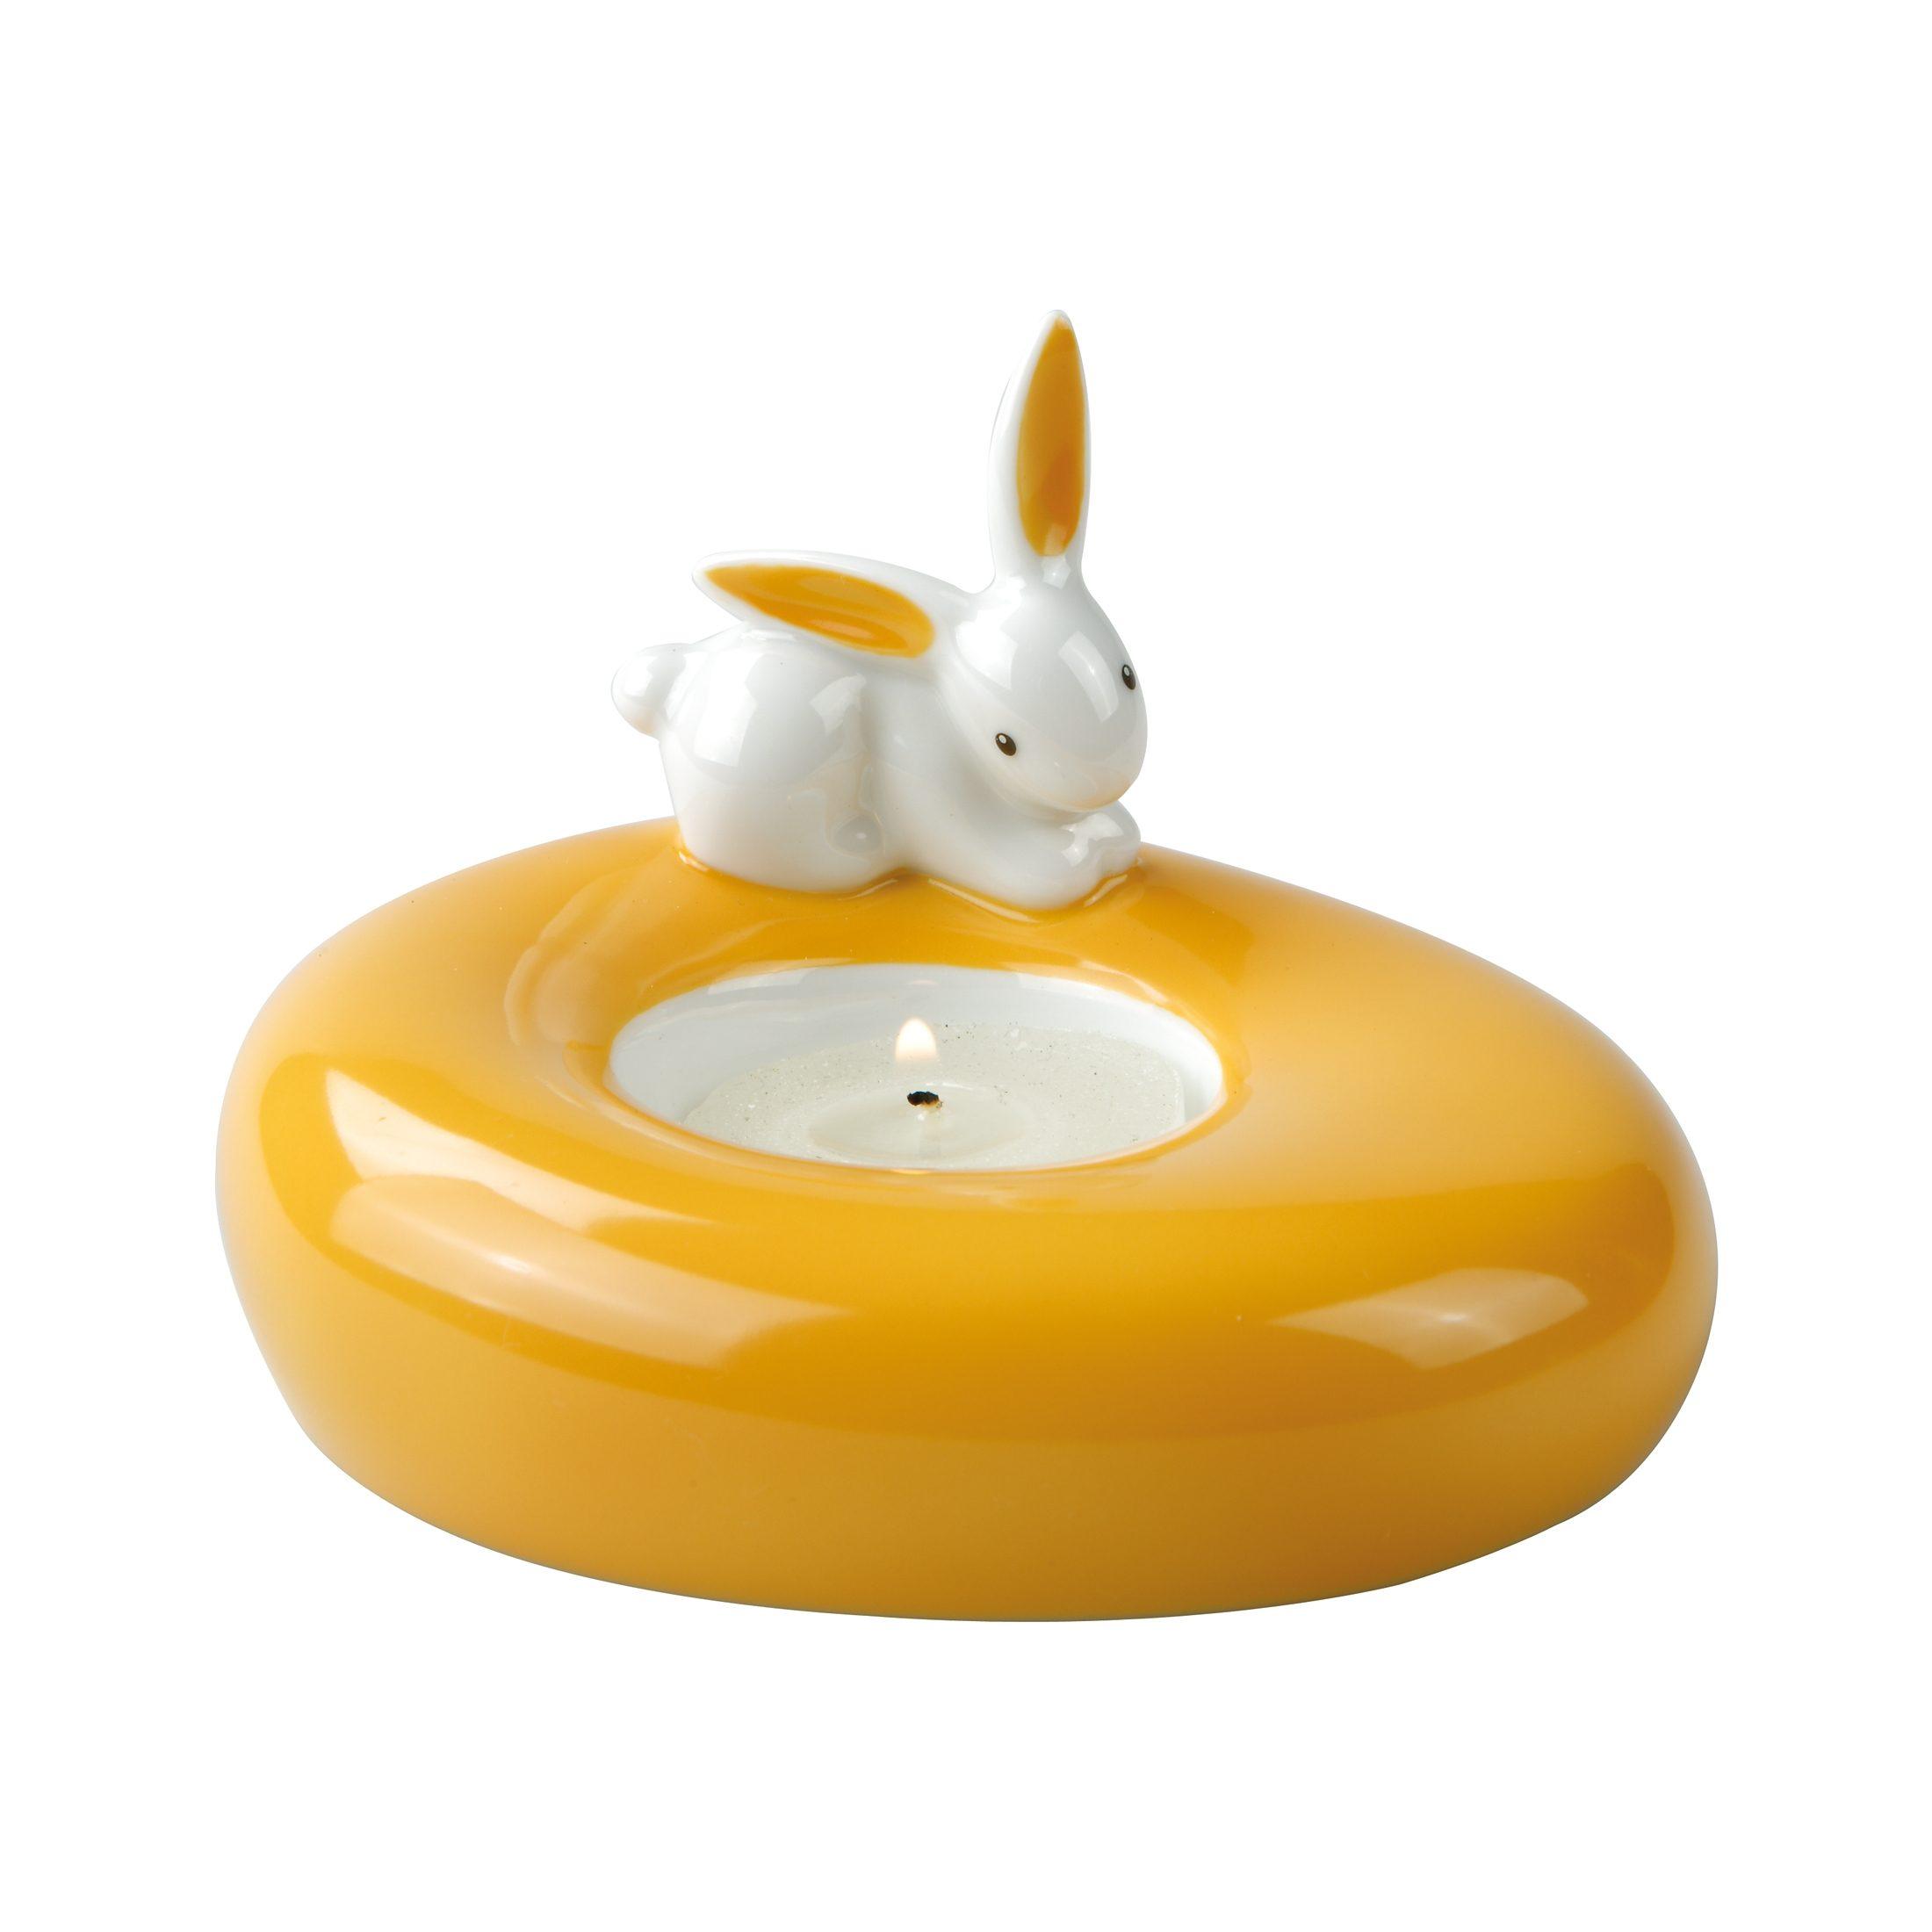 Goebel Orange Sunrise Bunny - Teelichthalter »Bunny de luxe«